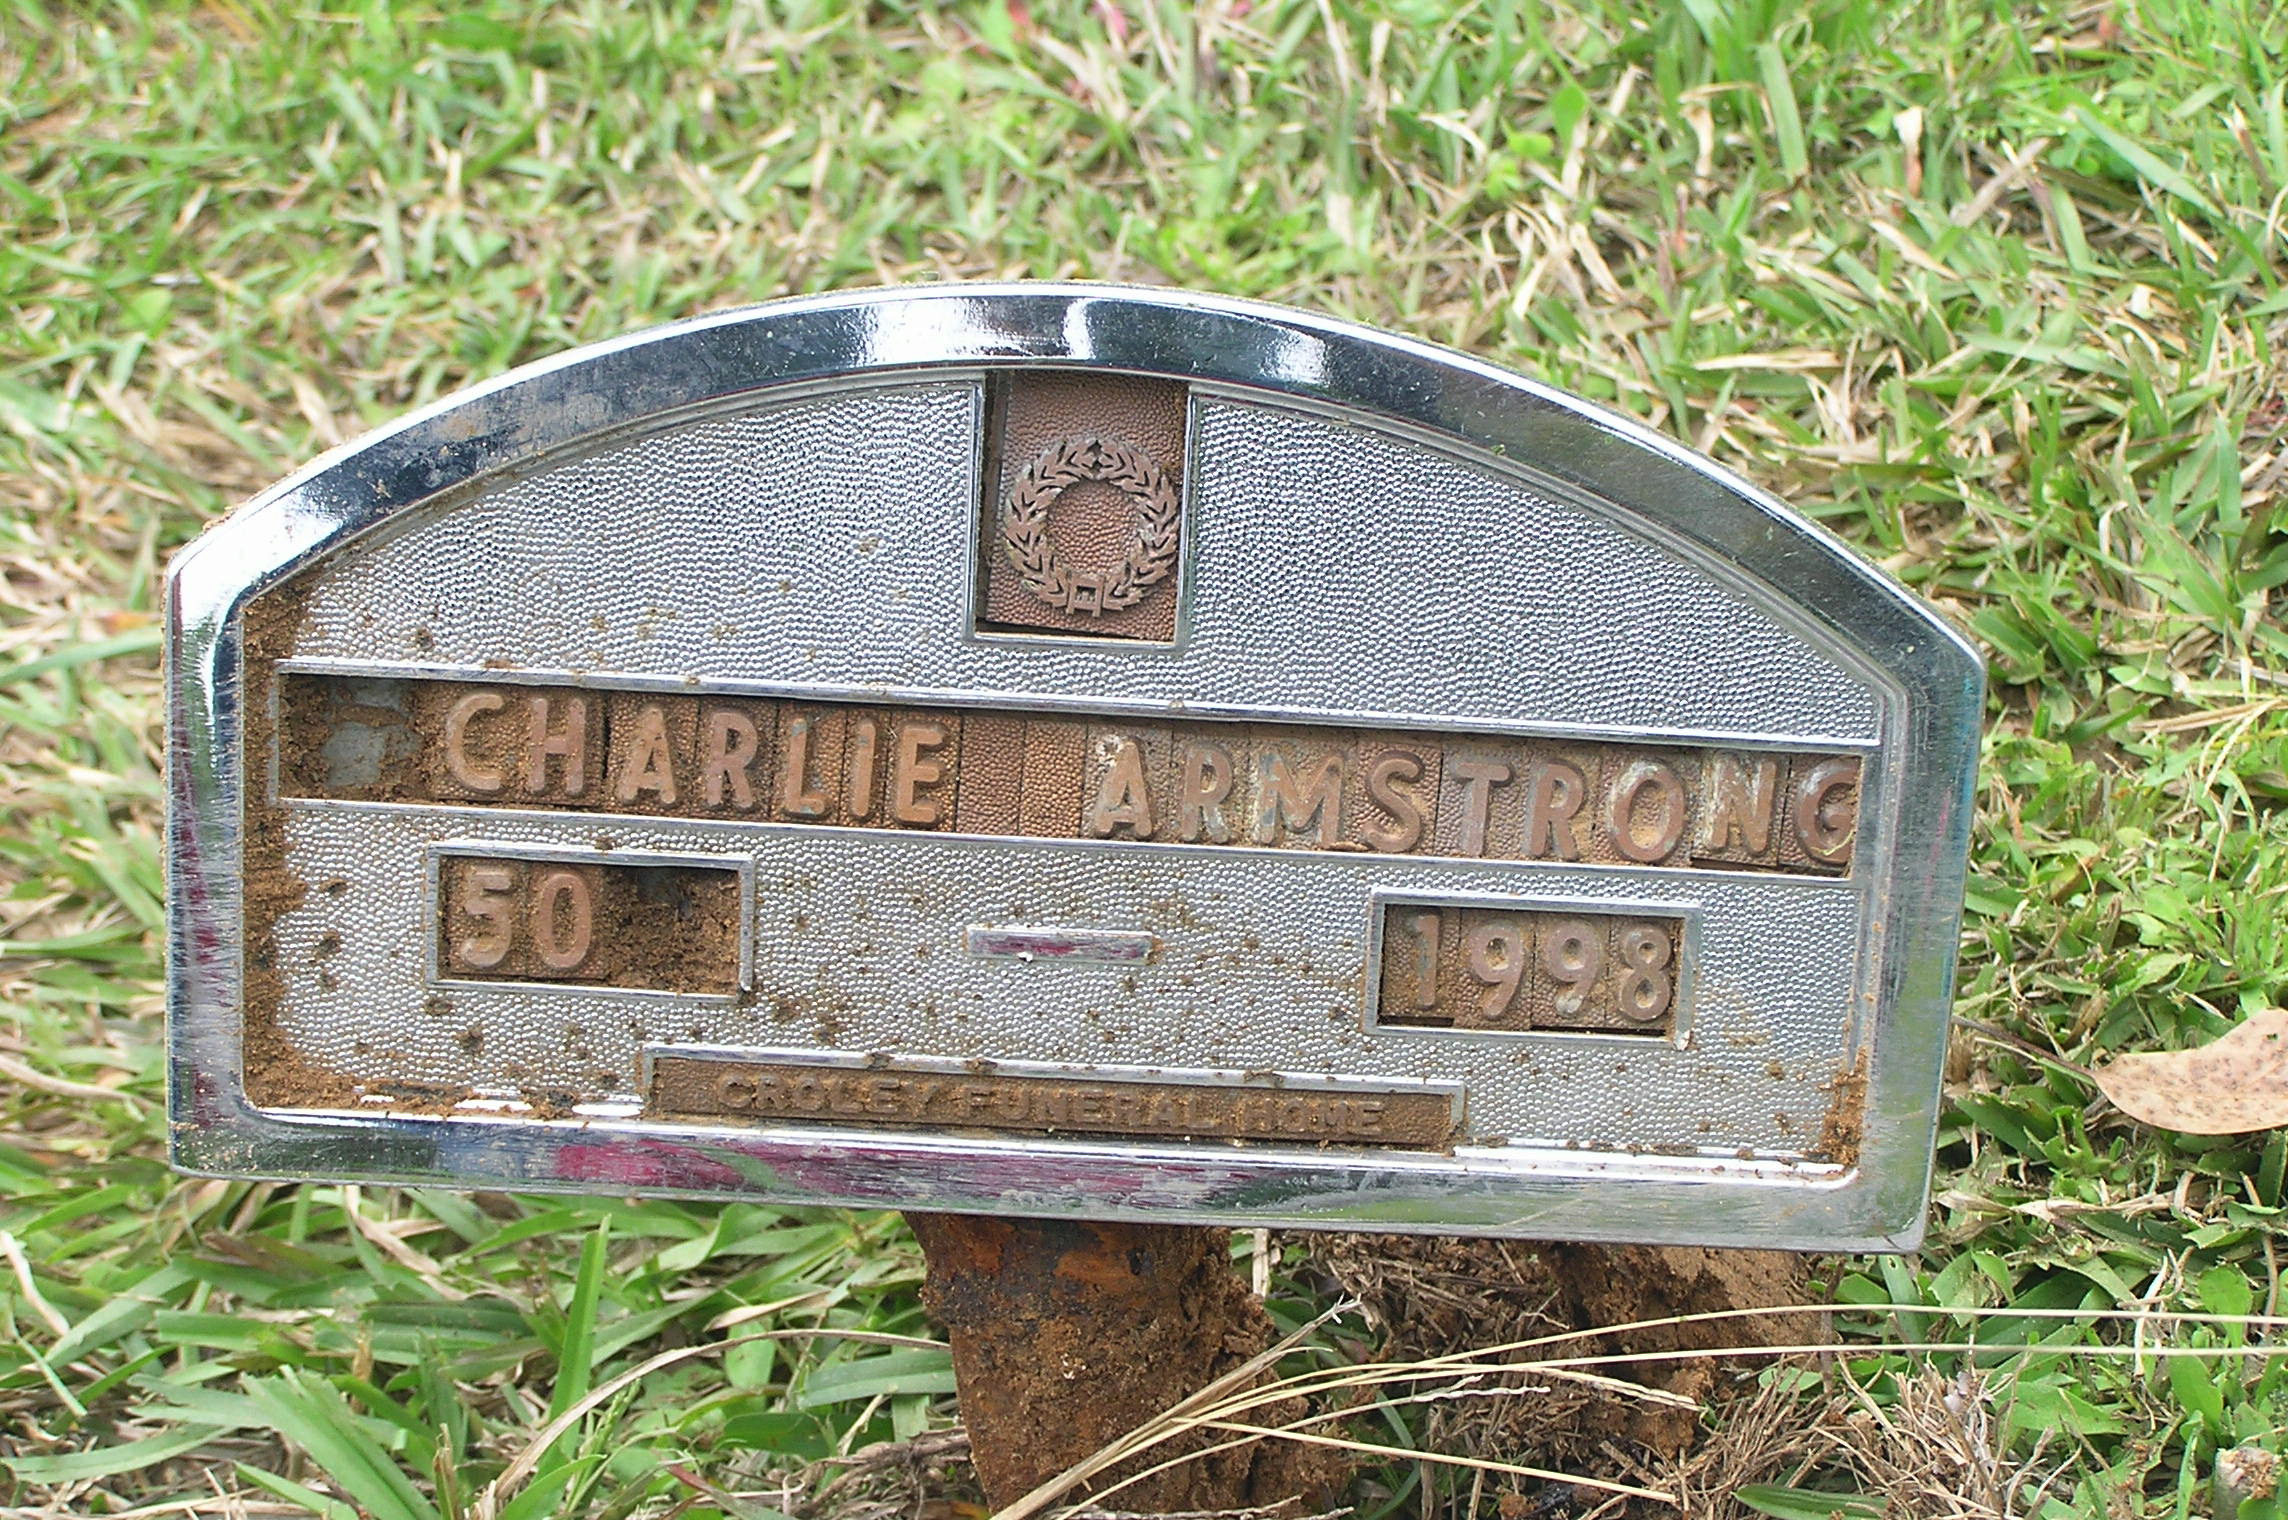 Charlie Carroll Armstrong